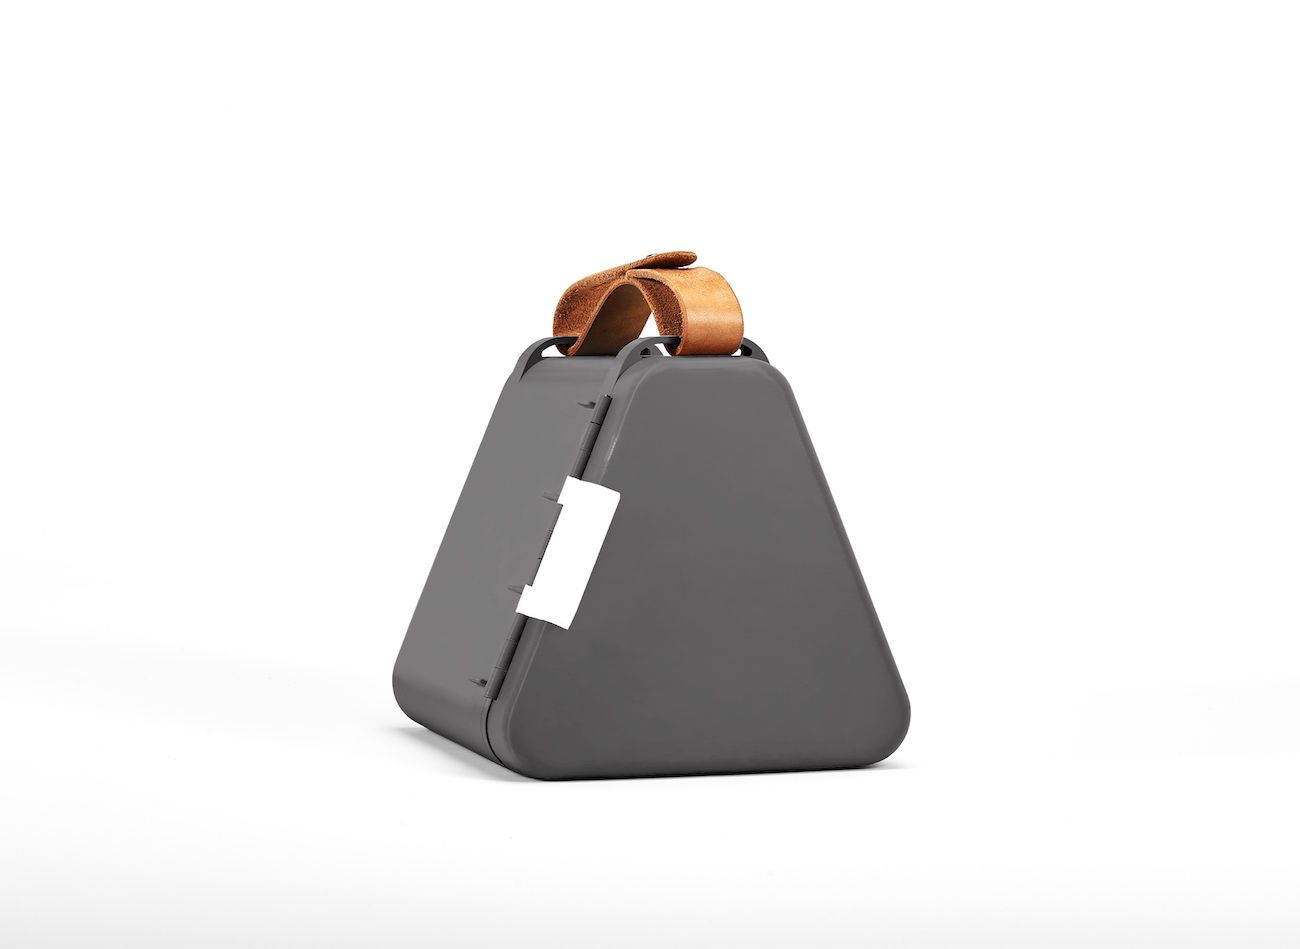 Teebee Portable Toy Box